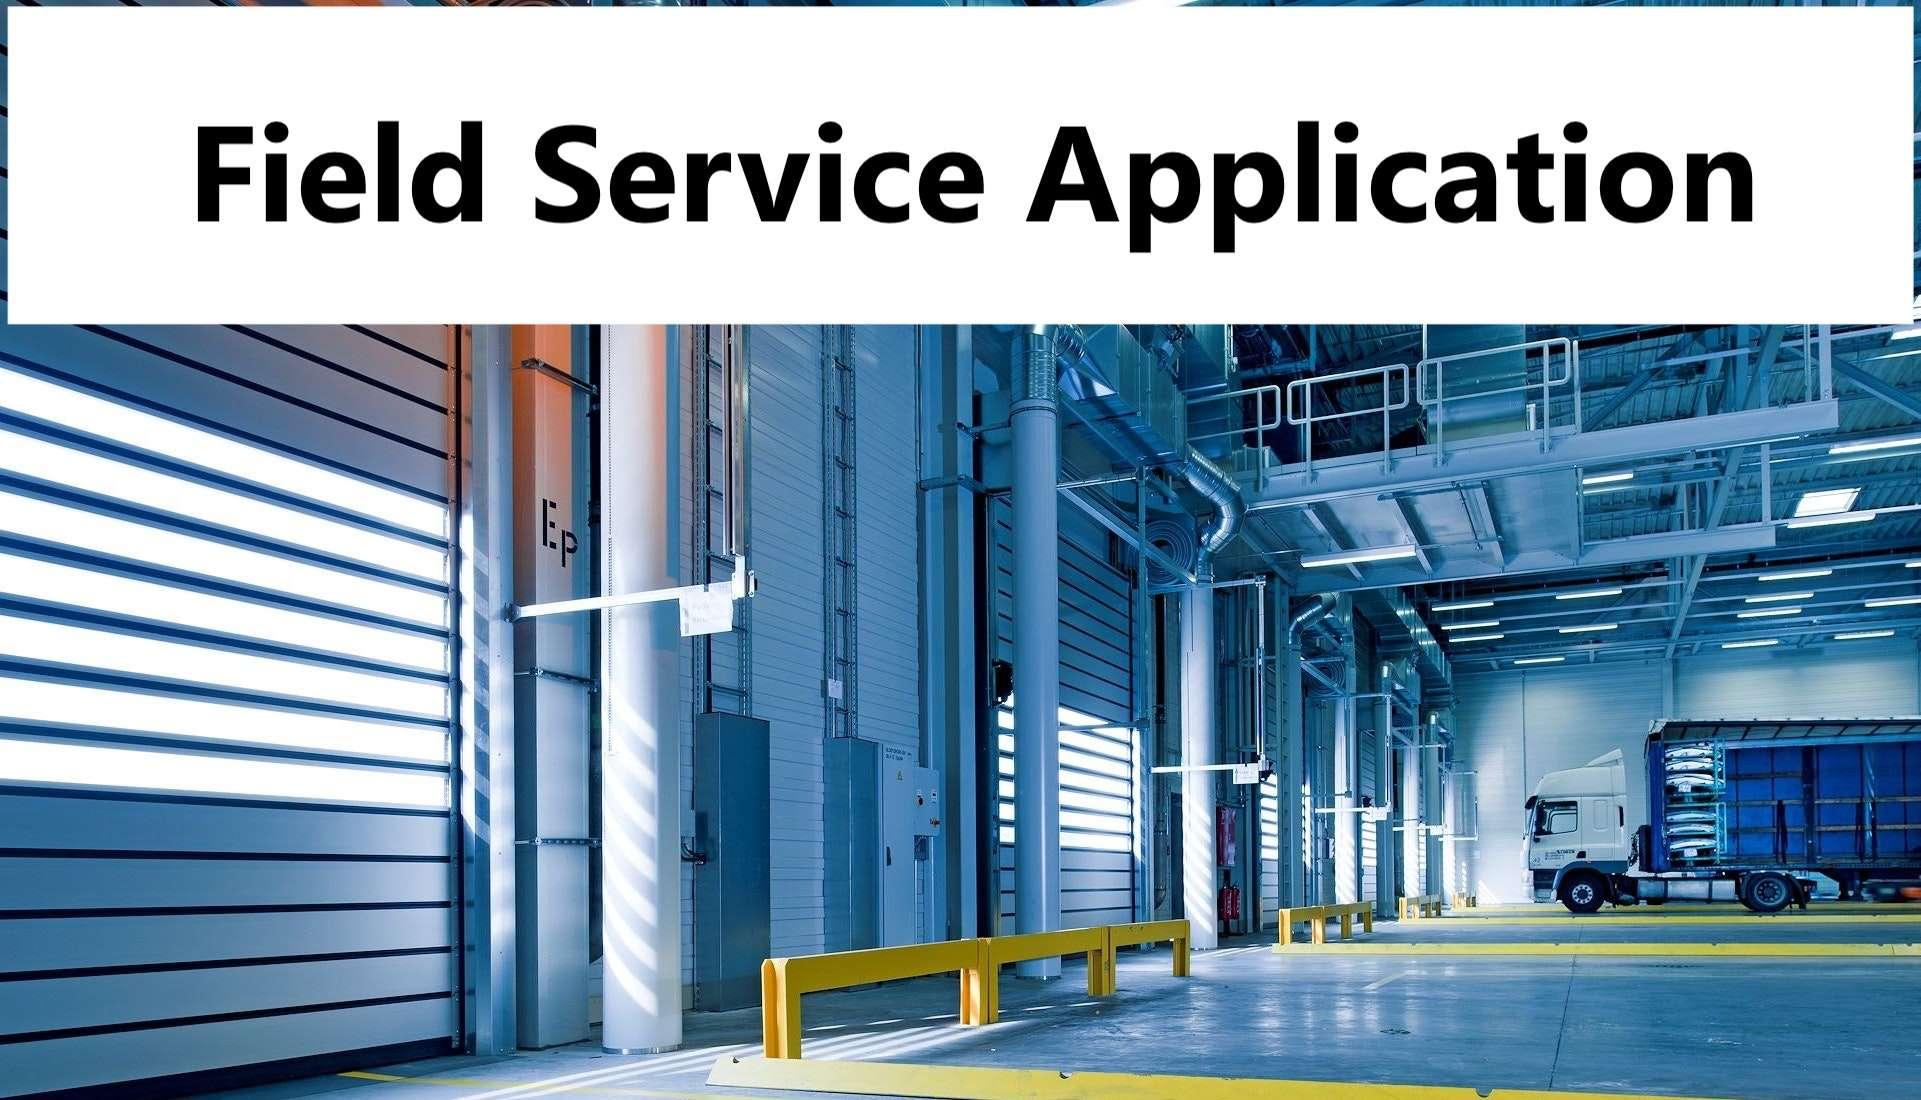 RAD Server Solution Series: [Field Service Application] - Blog